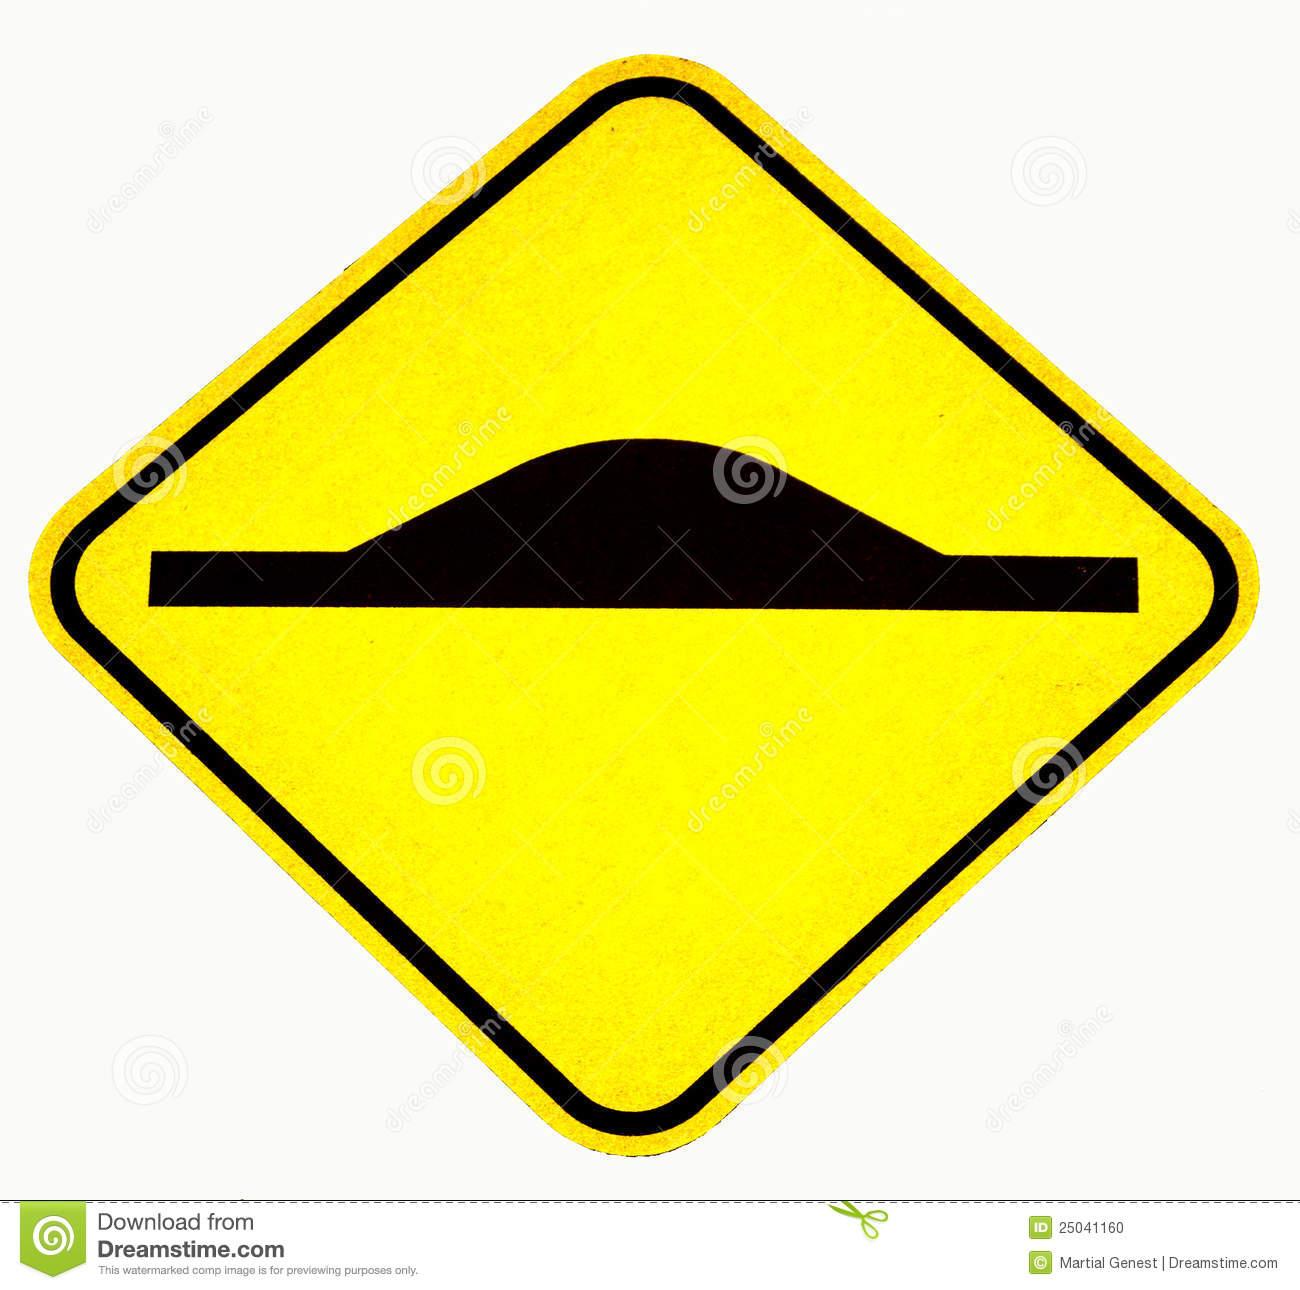 Speed bump clip art jpg royalty free stock Speed Bump Sign Stock Photo - Image: 25041160 jpg royalty free stock